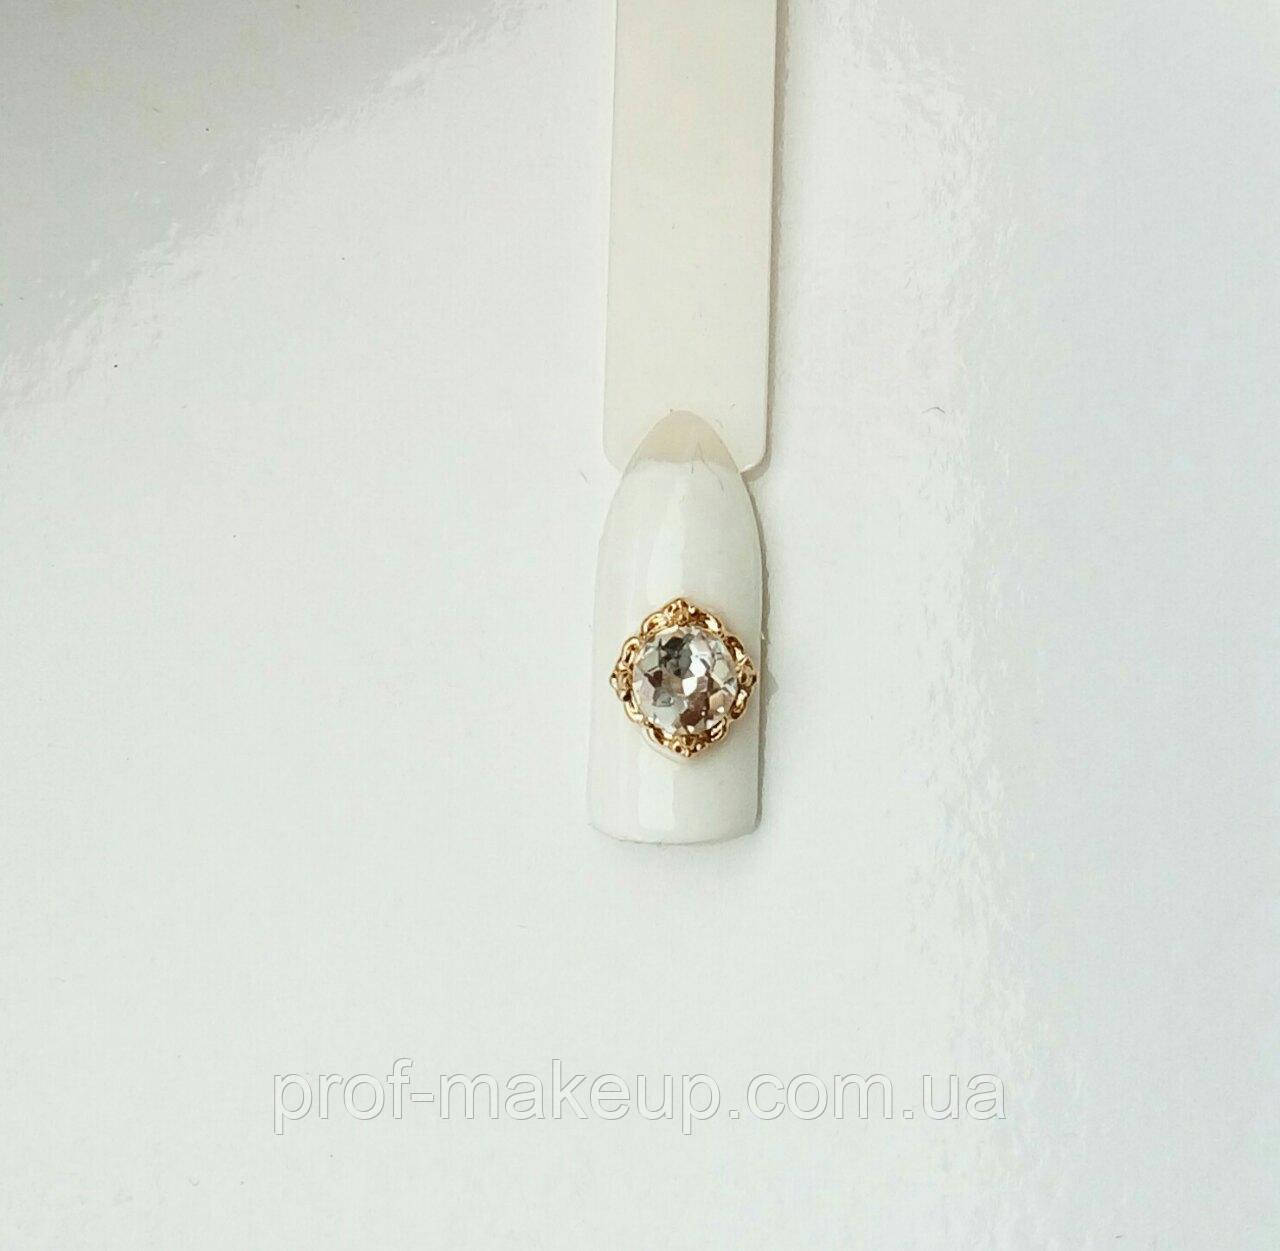 Украшение на ногти 3D,квадратик с камнем хамелеон в золотой оправе.